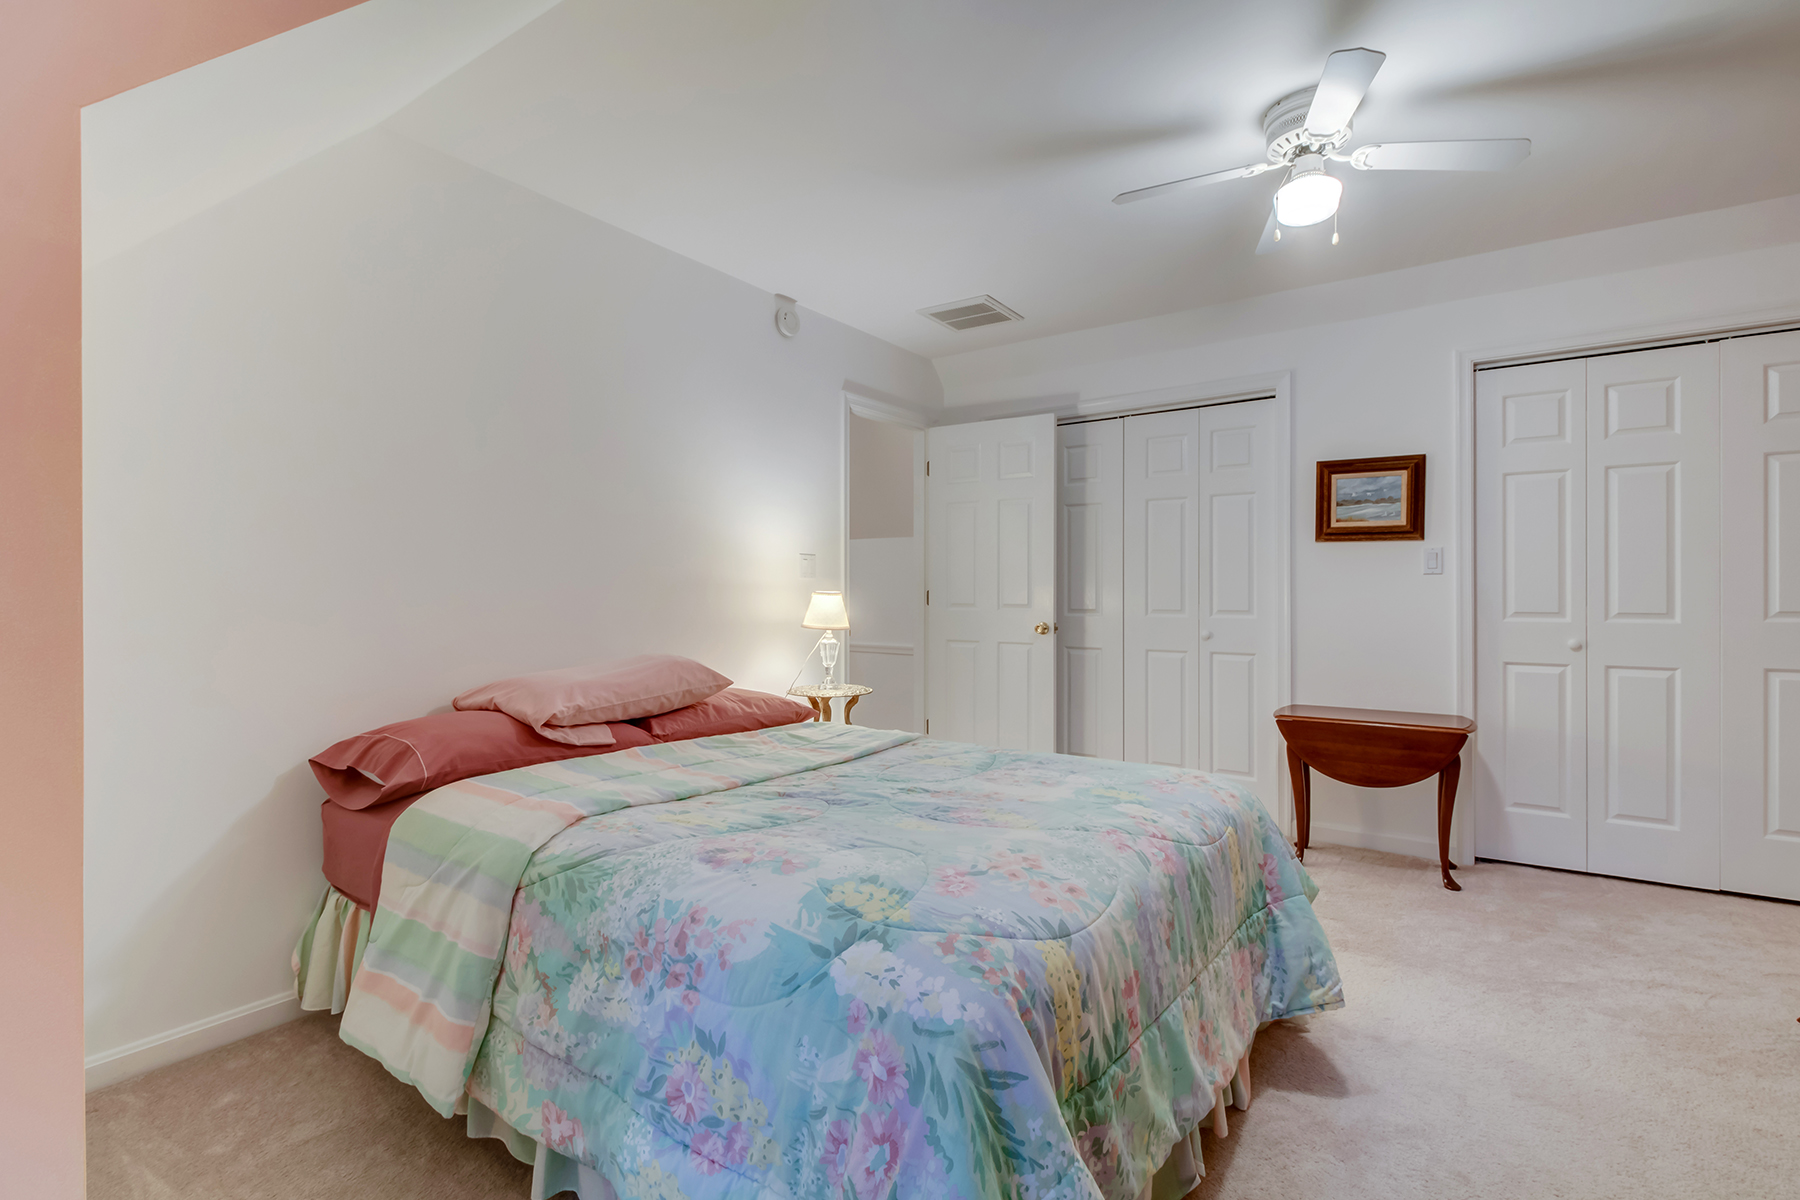 Additional photo for property listing at 32828 Pine Cone Ln , Frankford, DE 19945 32828  Pine Cone Ln, Frankford, Delaware 19945 Estados Unidos